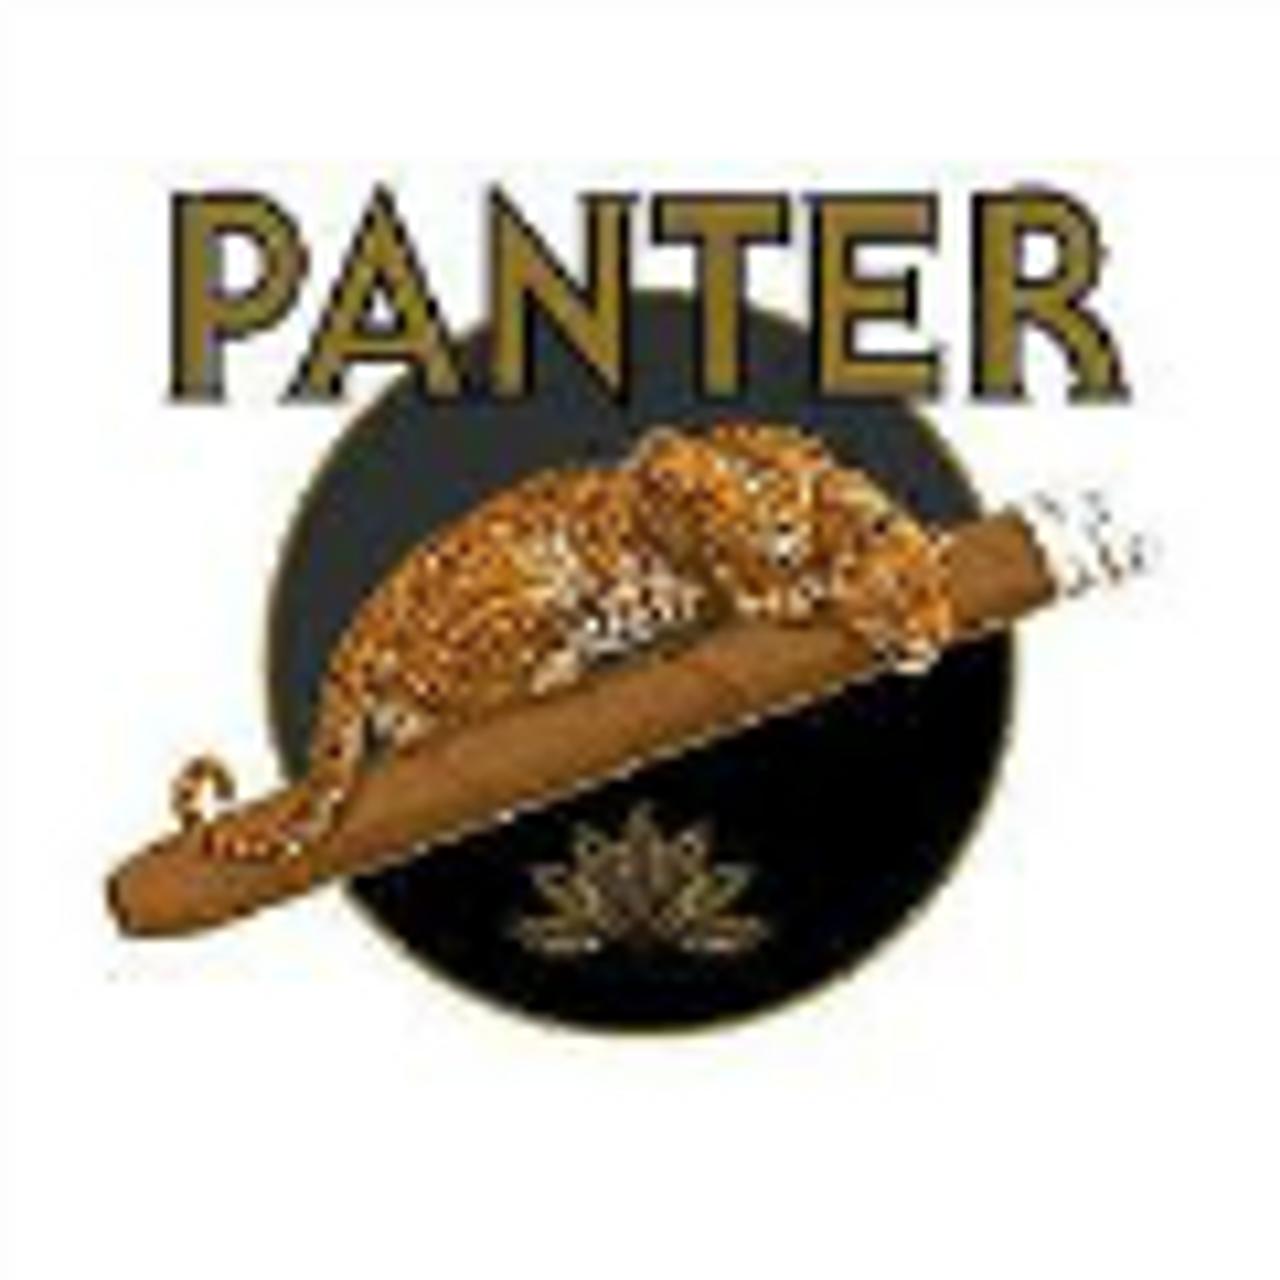 Panter Blue Cigars (10 Packs of 20) - Natural